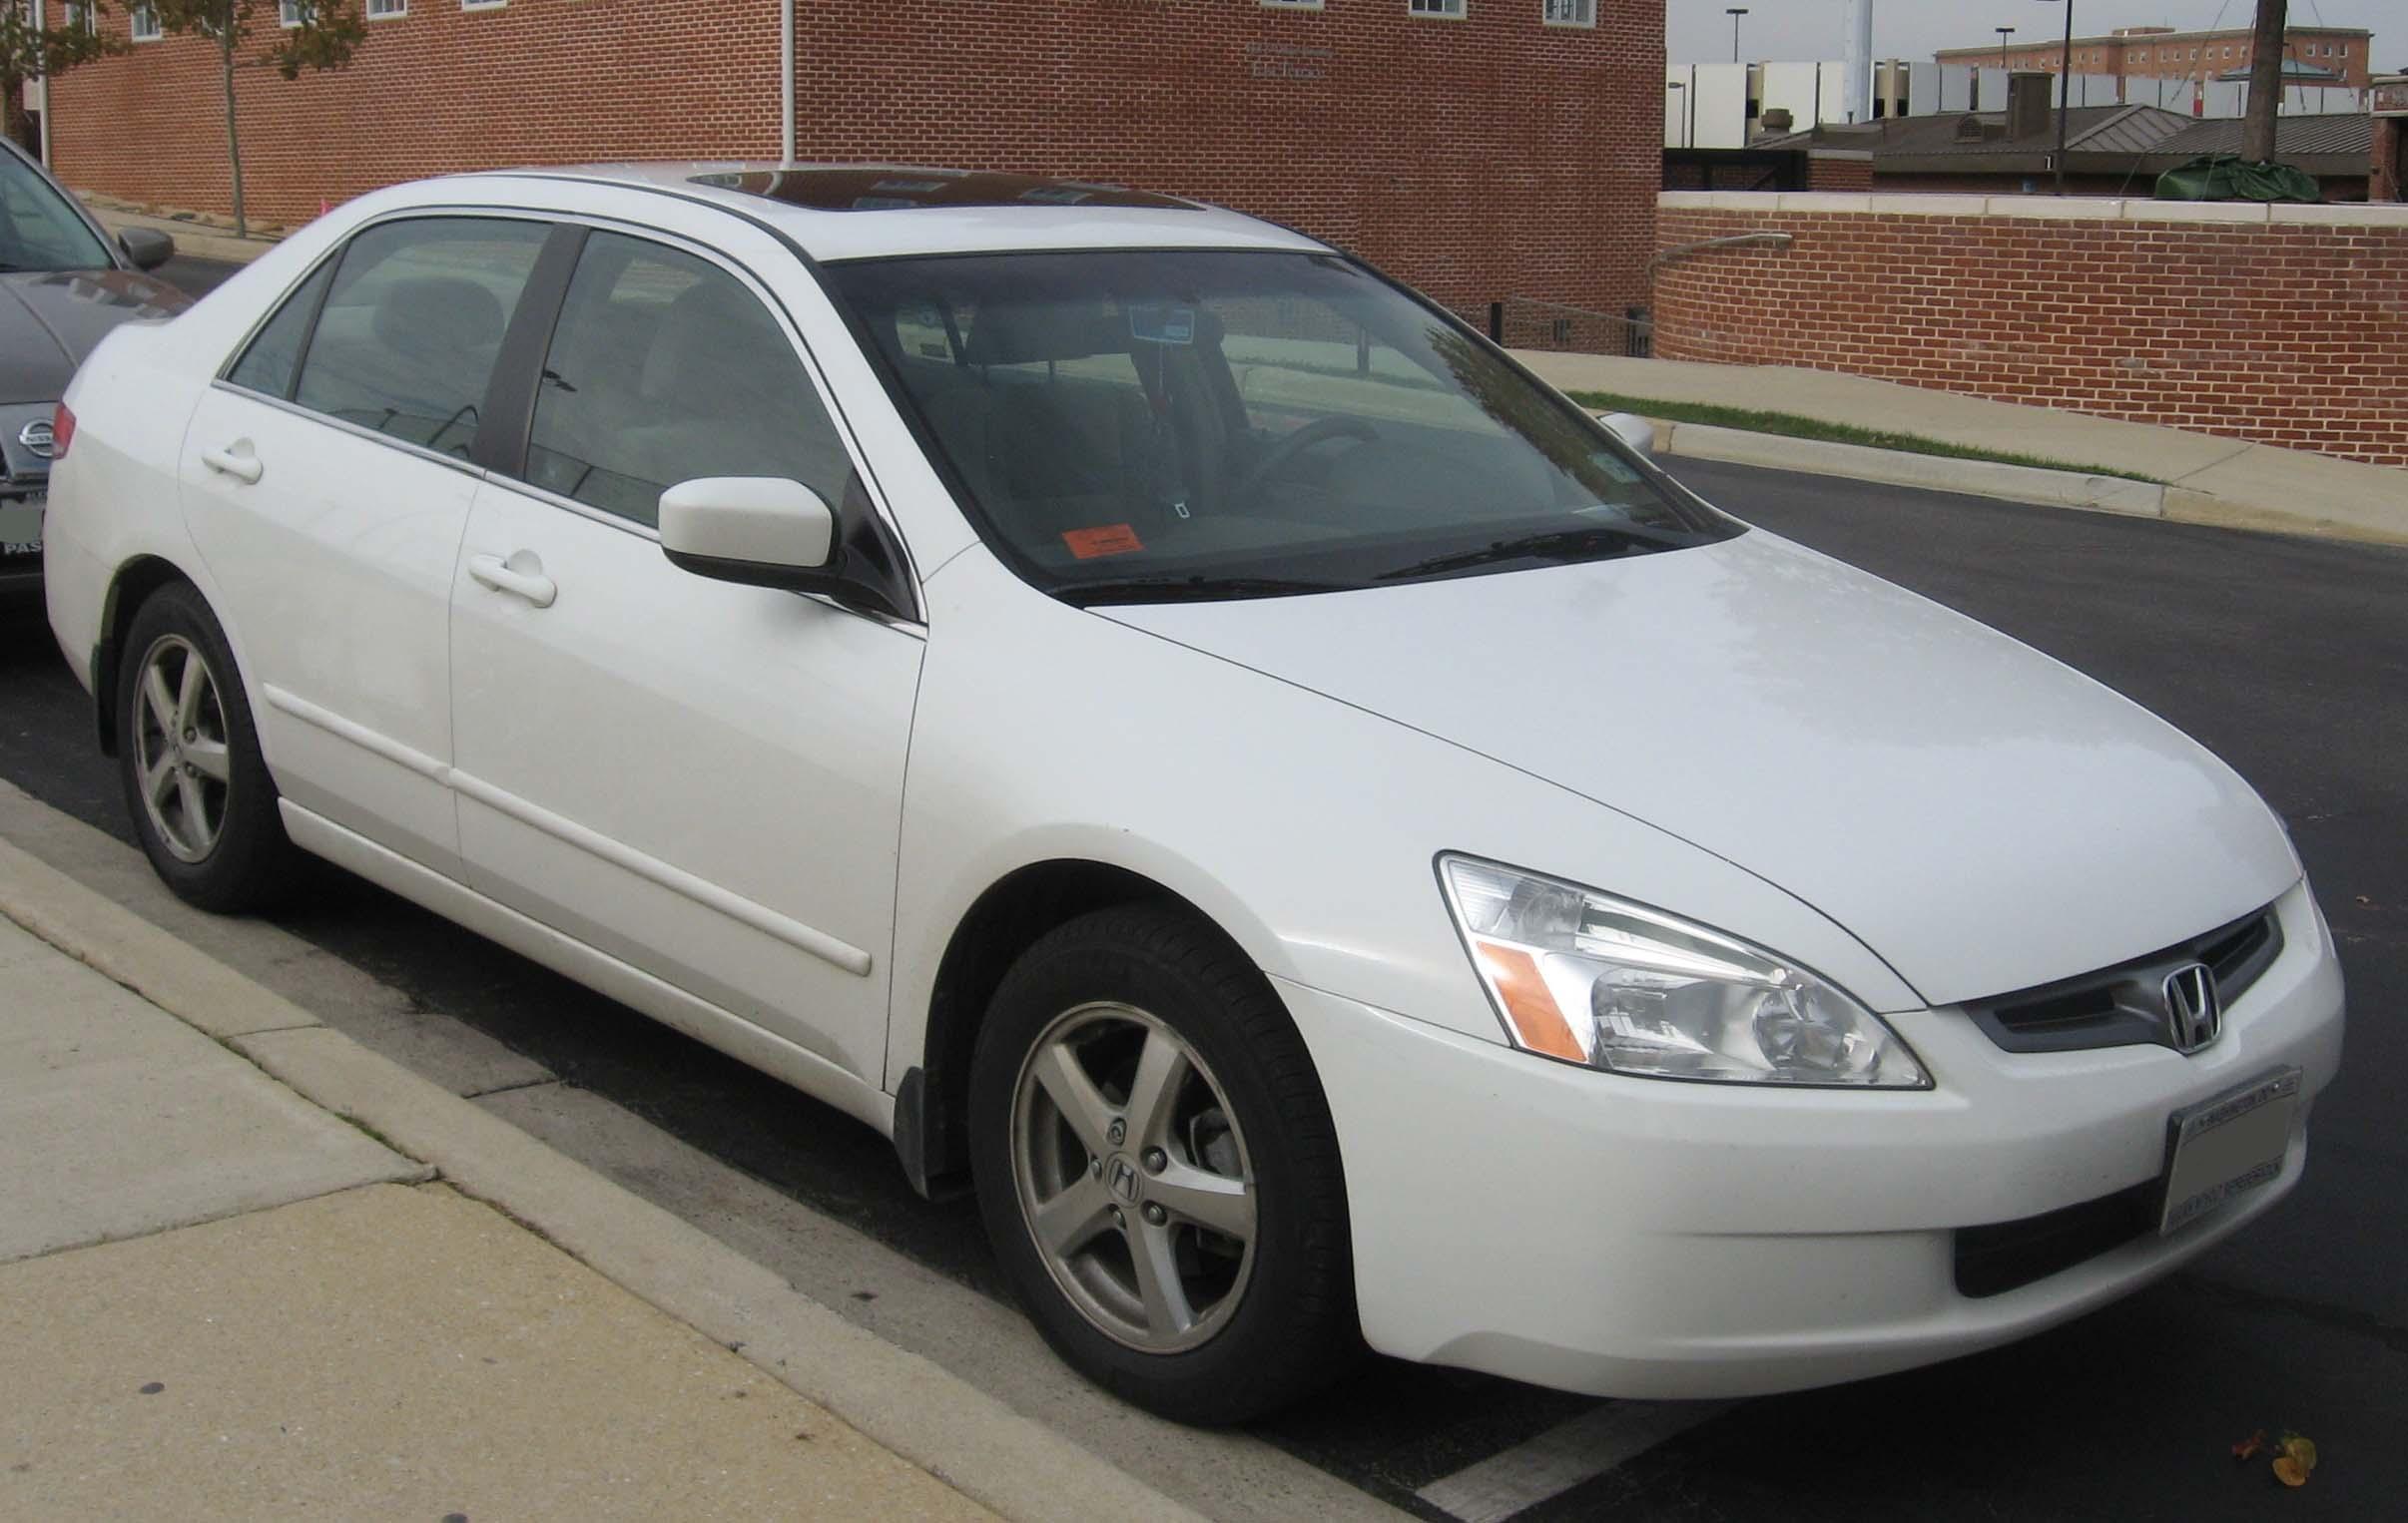 File:03 04 Honda Accord EX